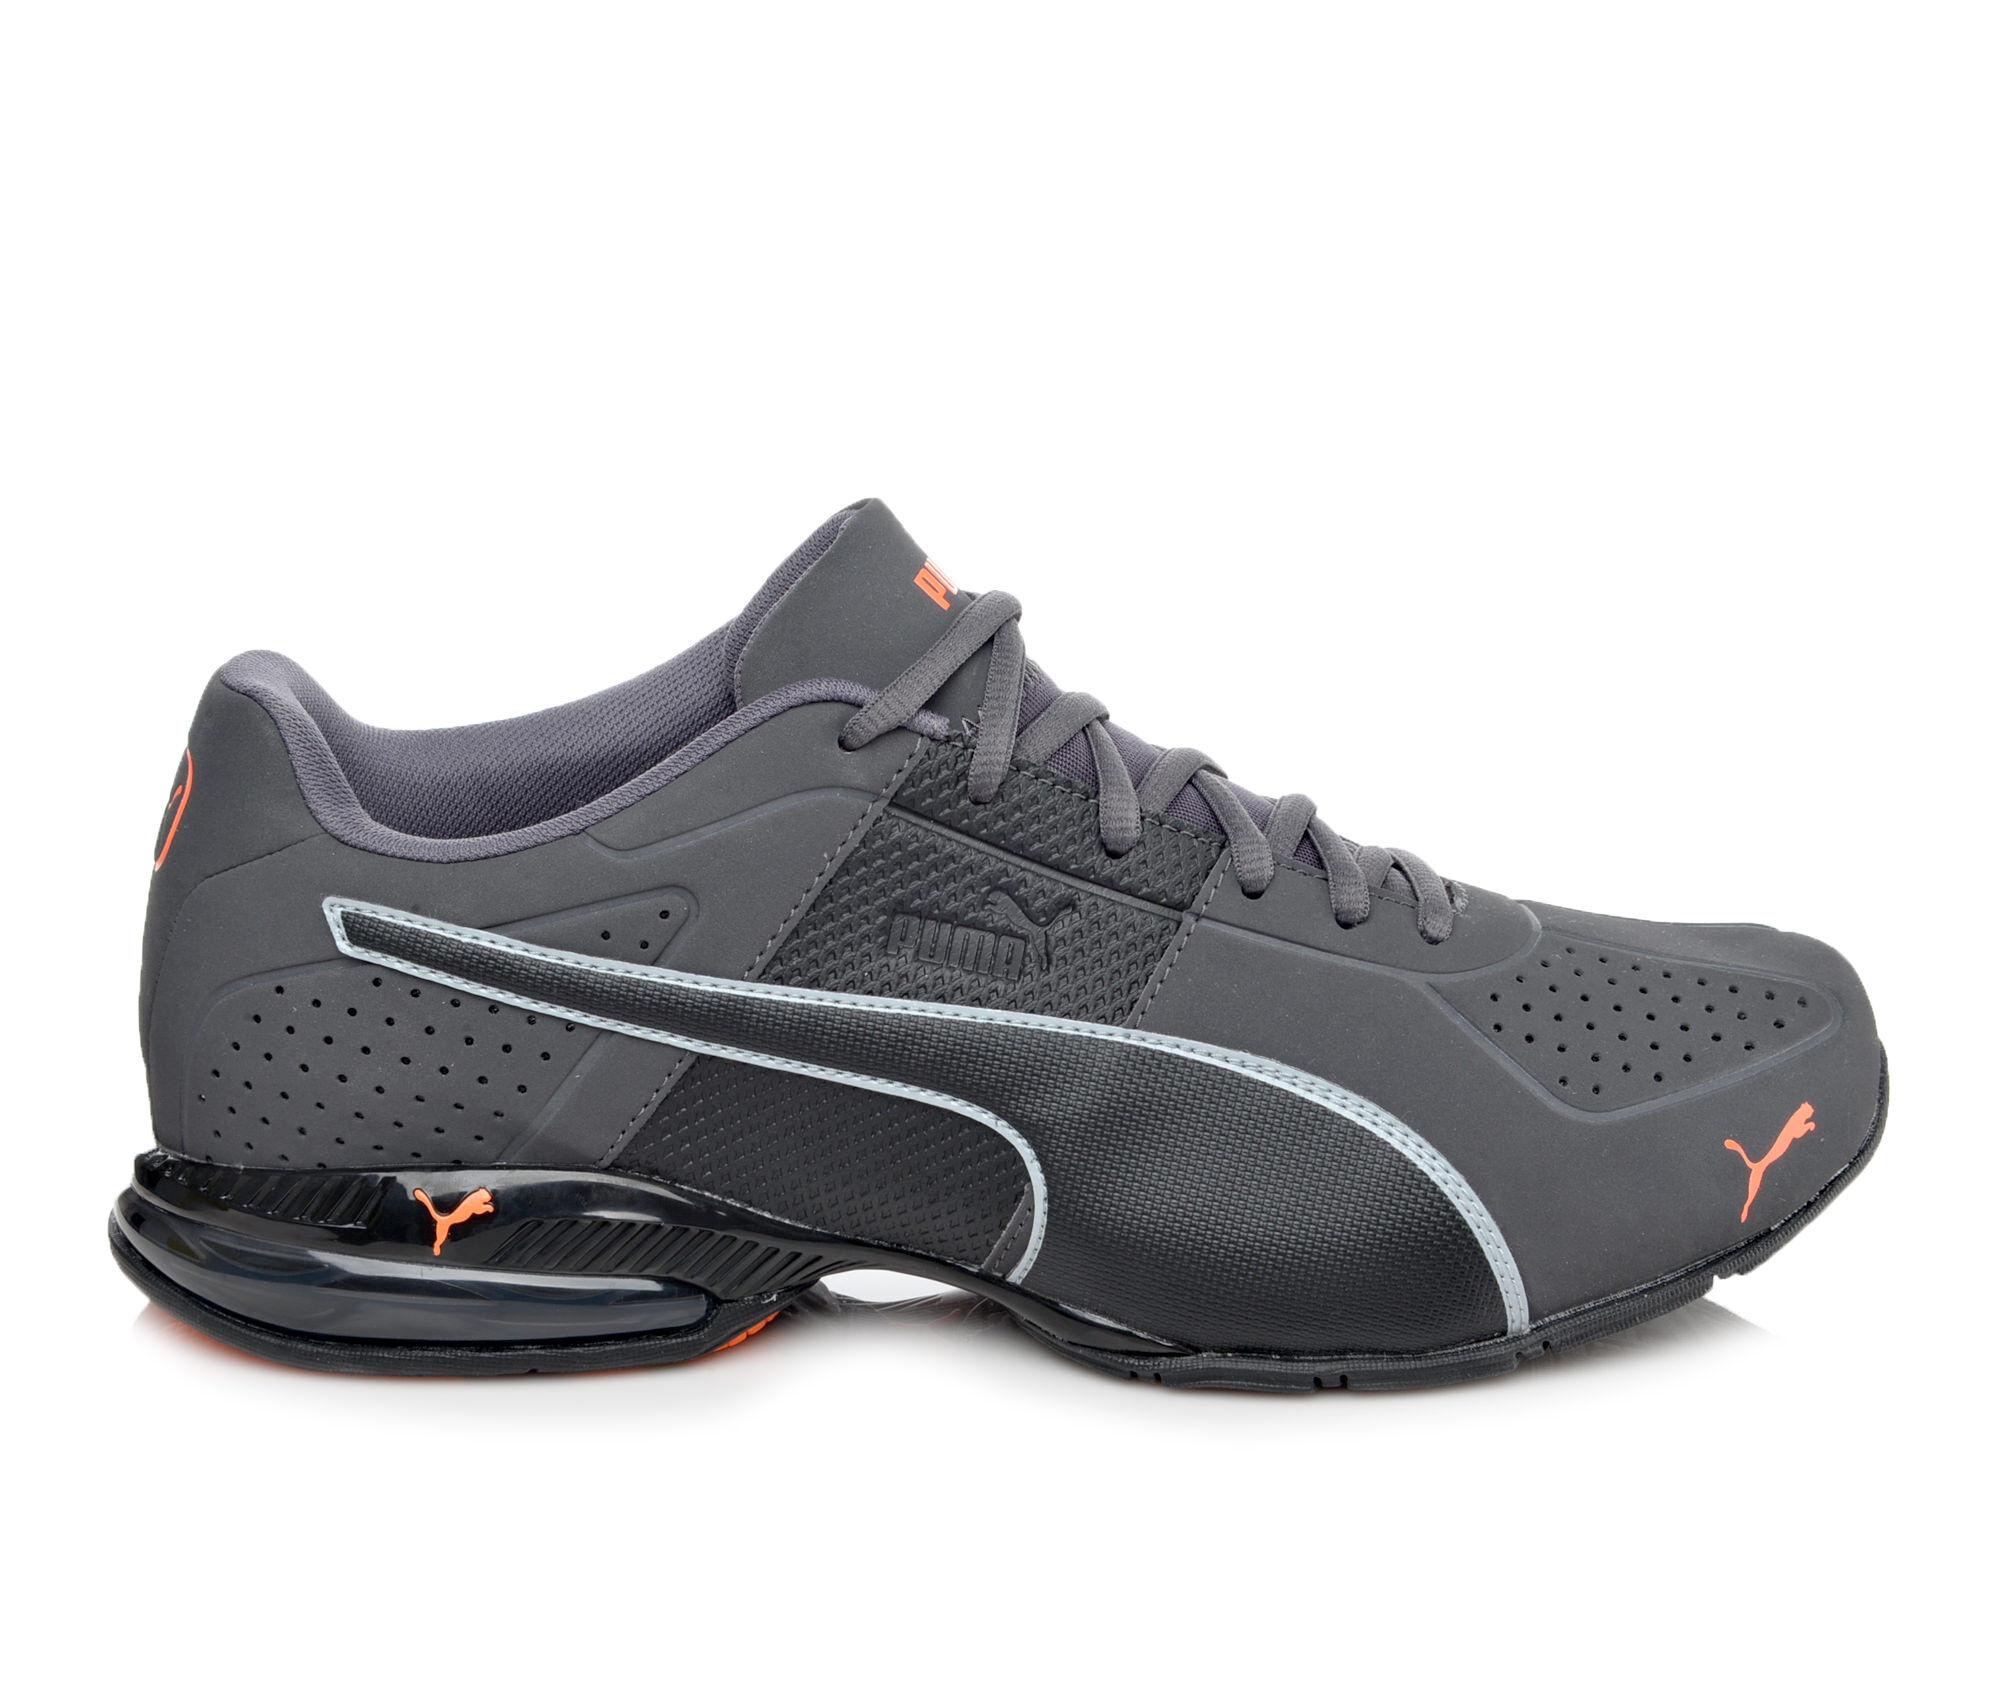 Men's Puma Cell Surin 2 Matte Sneakers Grey/Org